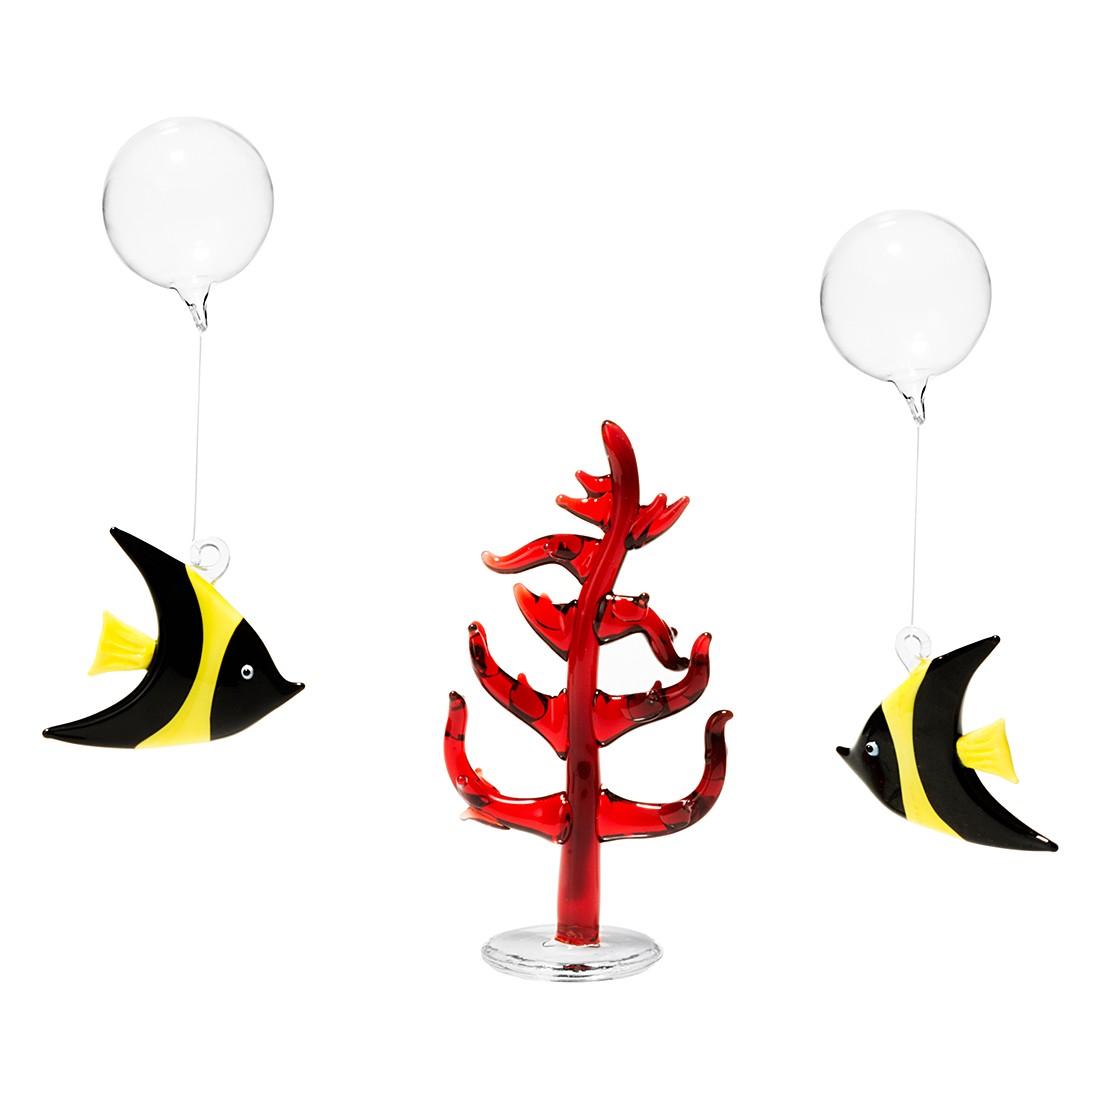 Figuren (3er-Set) – Fische, Koralle Mare, Leonardo jetzt bestellen